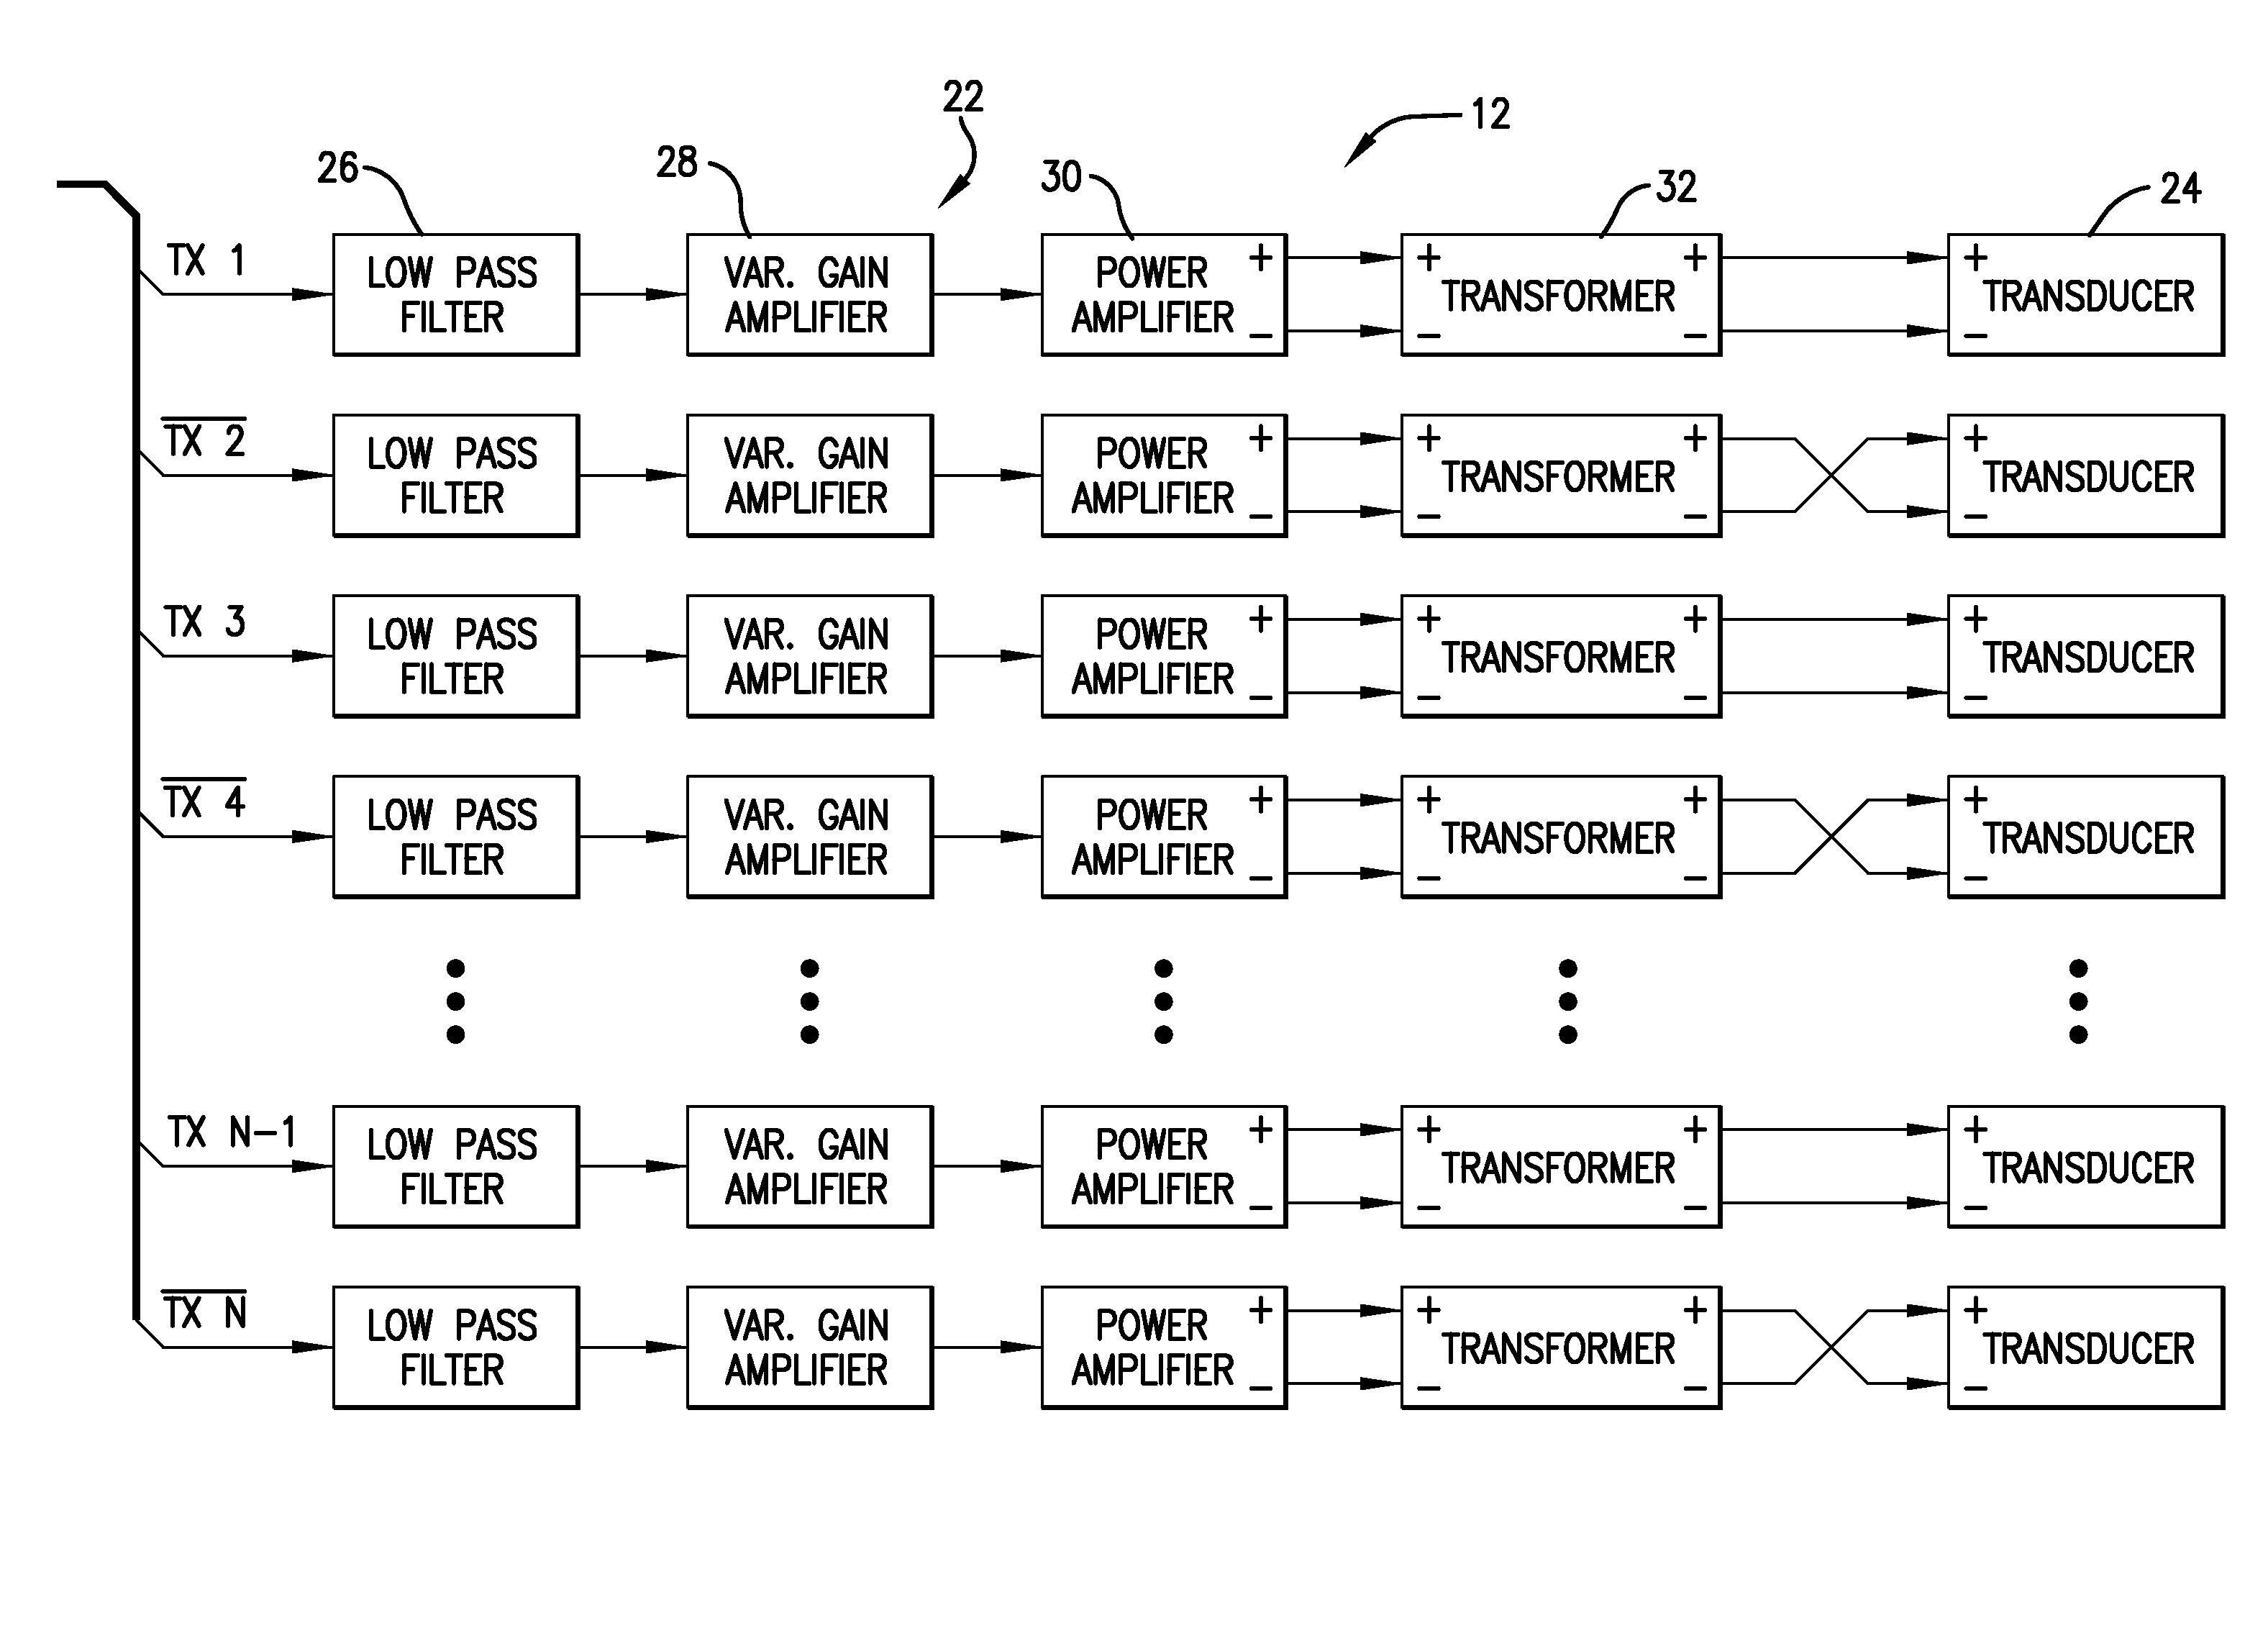 Patent US 9,784,826 B2